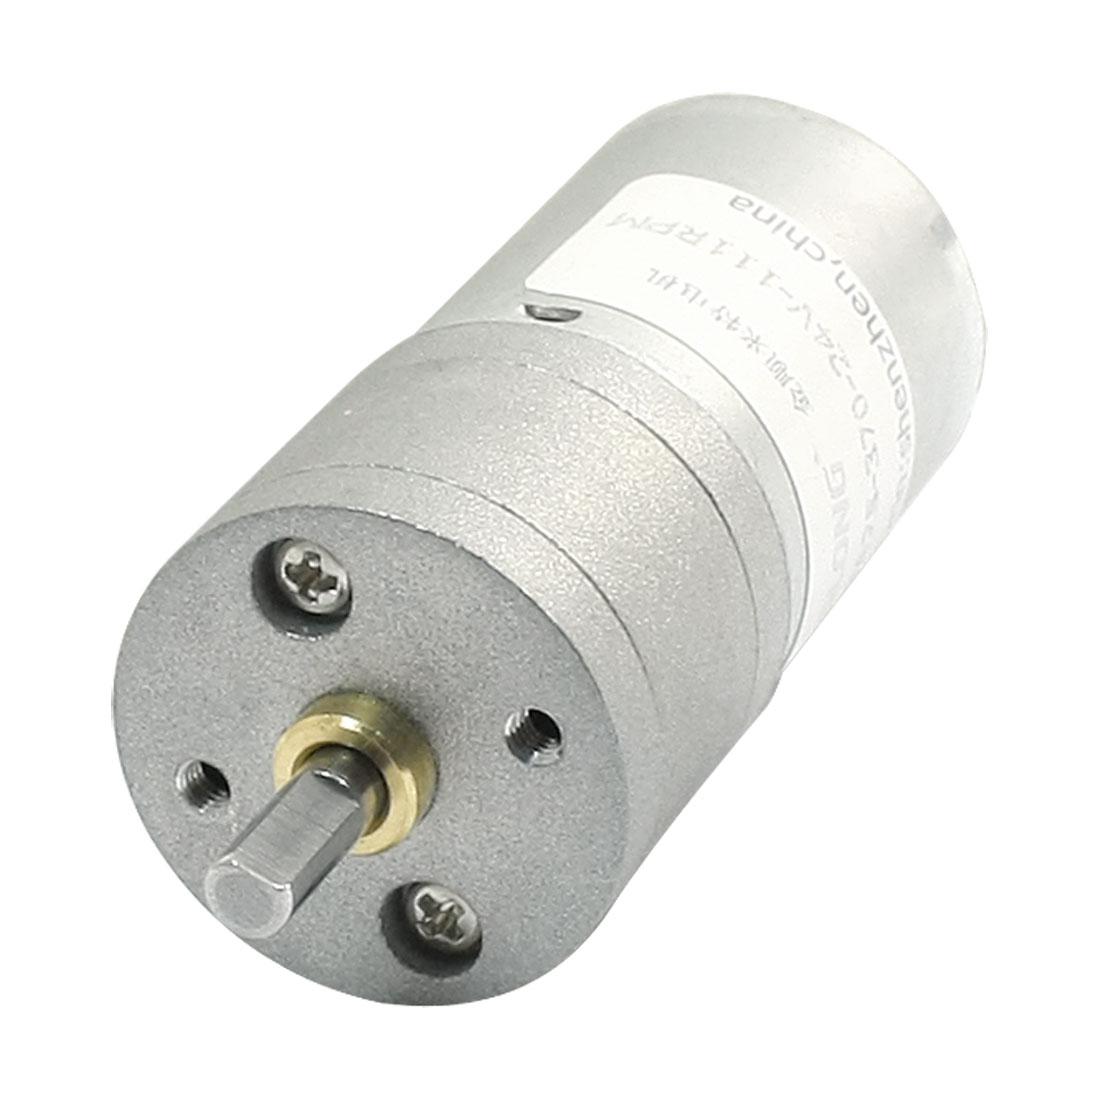 GA25-370 DC 24V 111r/min Cylinder Shape Case Speed Reduce Gear Motor